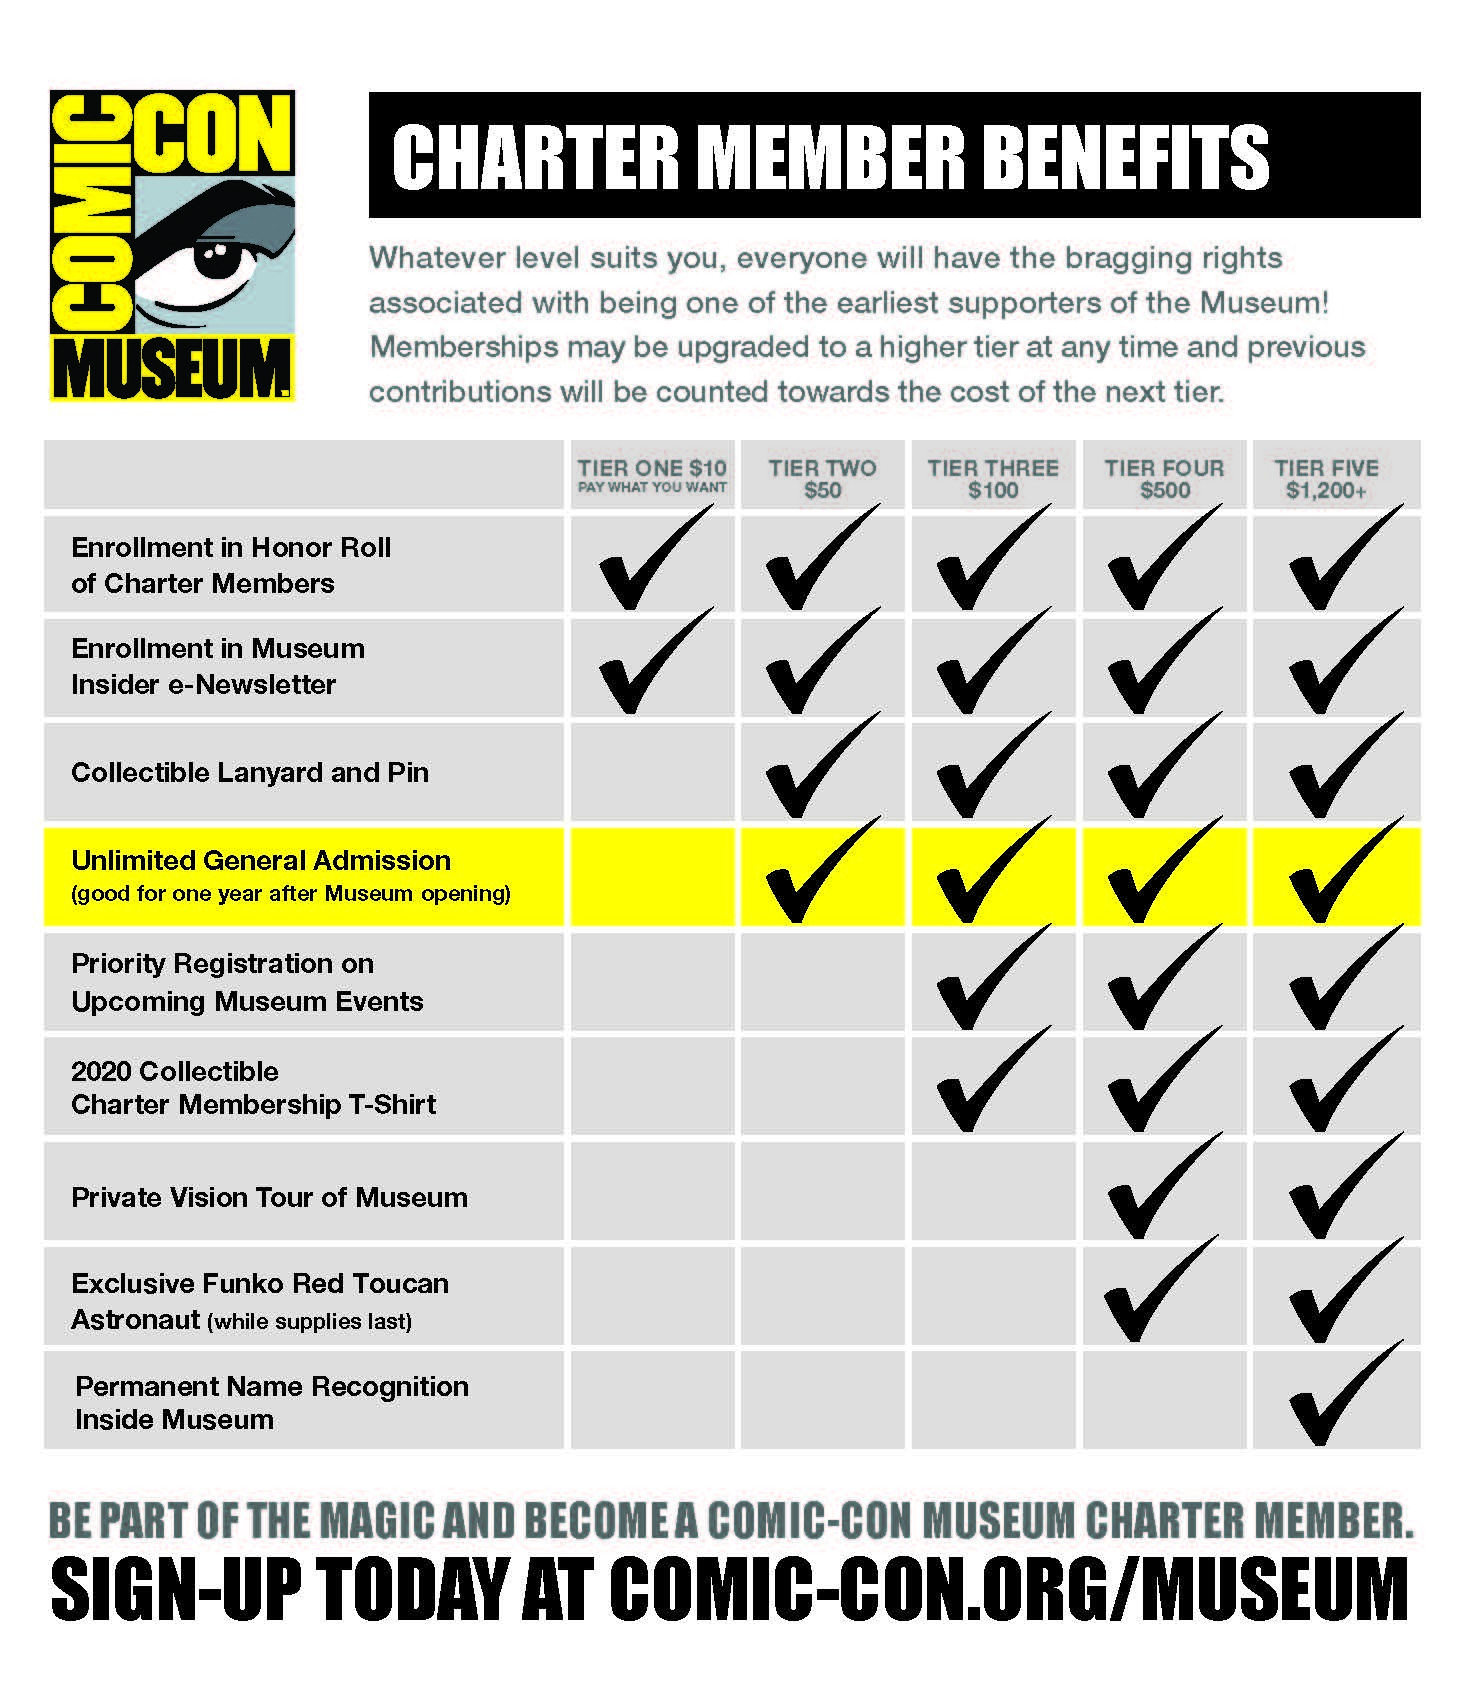 Charter Member Benefits